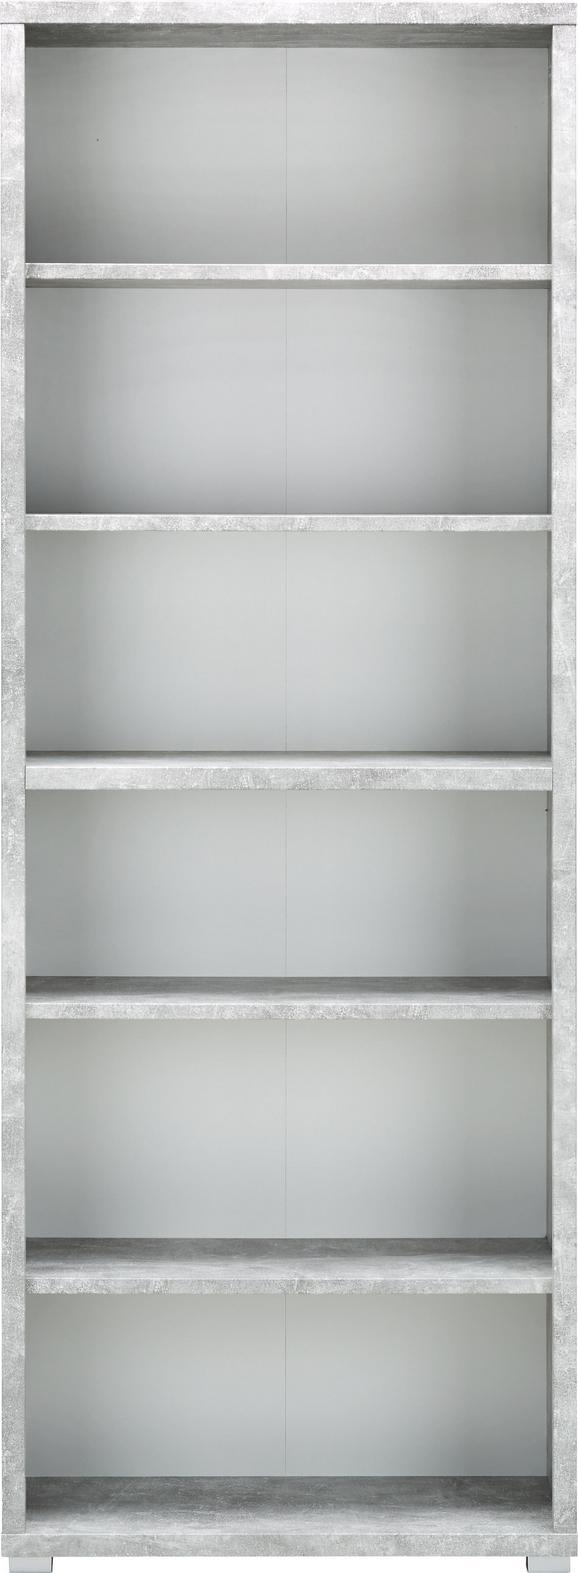 Regal Line4 - siva/bela, Moderno, leseni material (80/218/36cm) - Mömax modern living